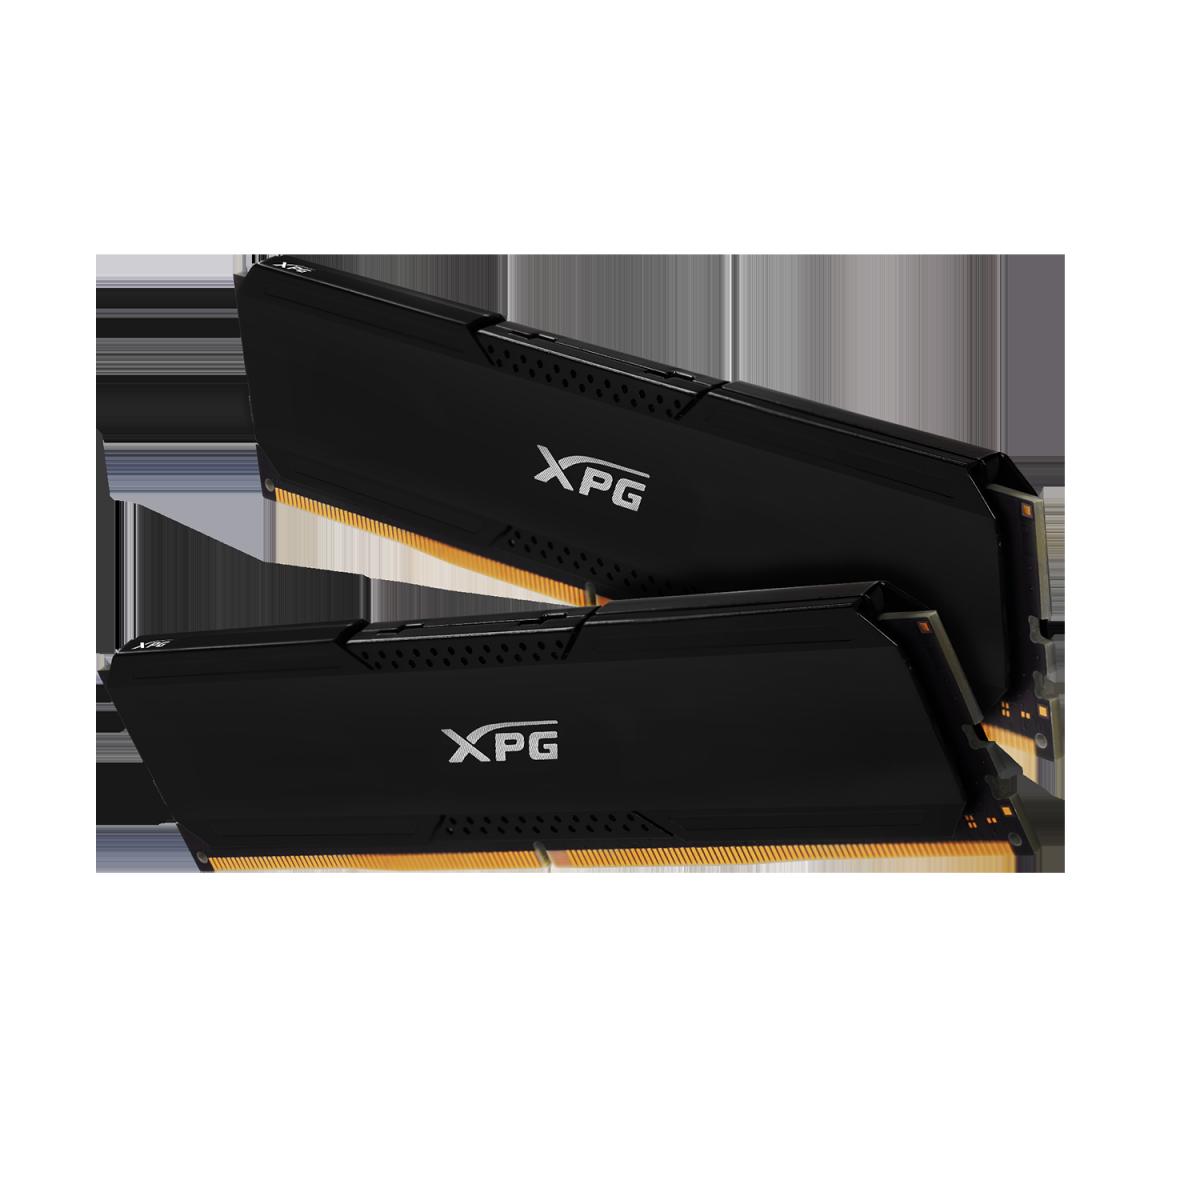 Memória DDR4 XPG Gammix D20, 16GB (2x8GB), 3200Mhz, CL16, Grey, AX4U320088G16A-DCTG20